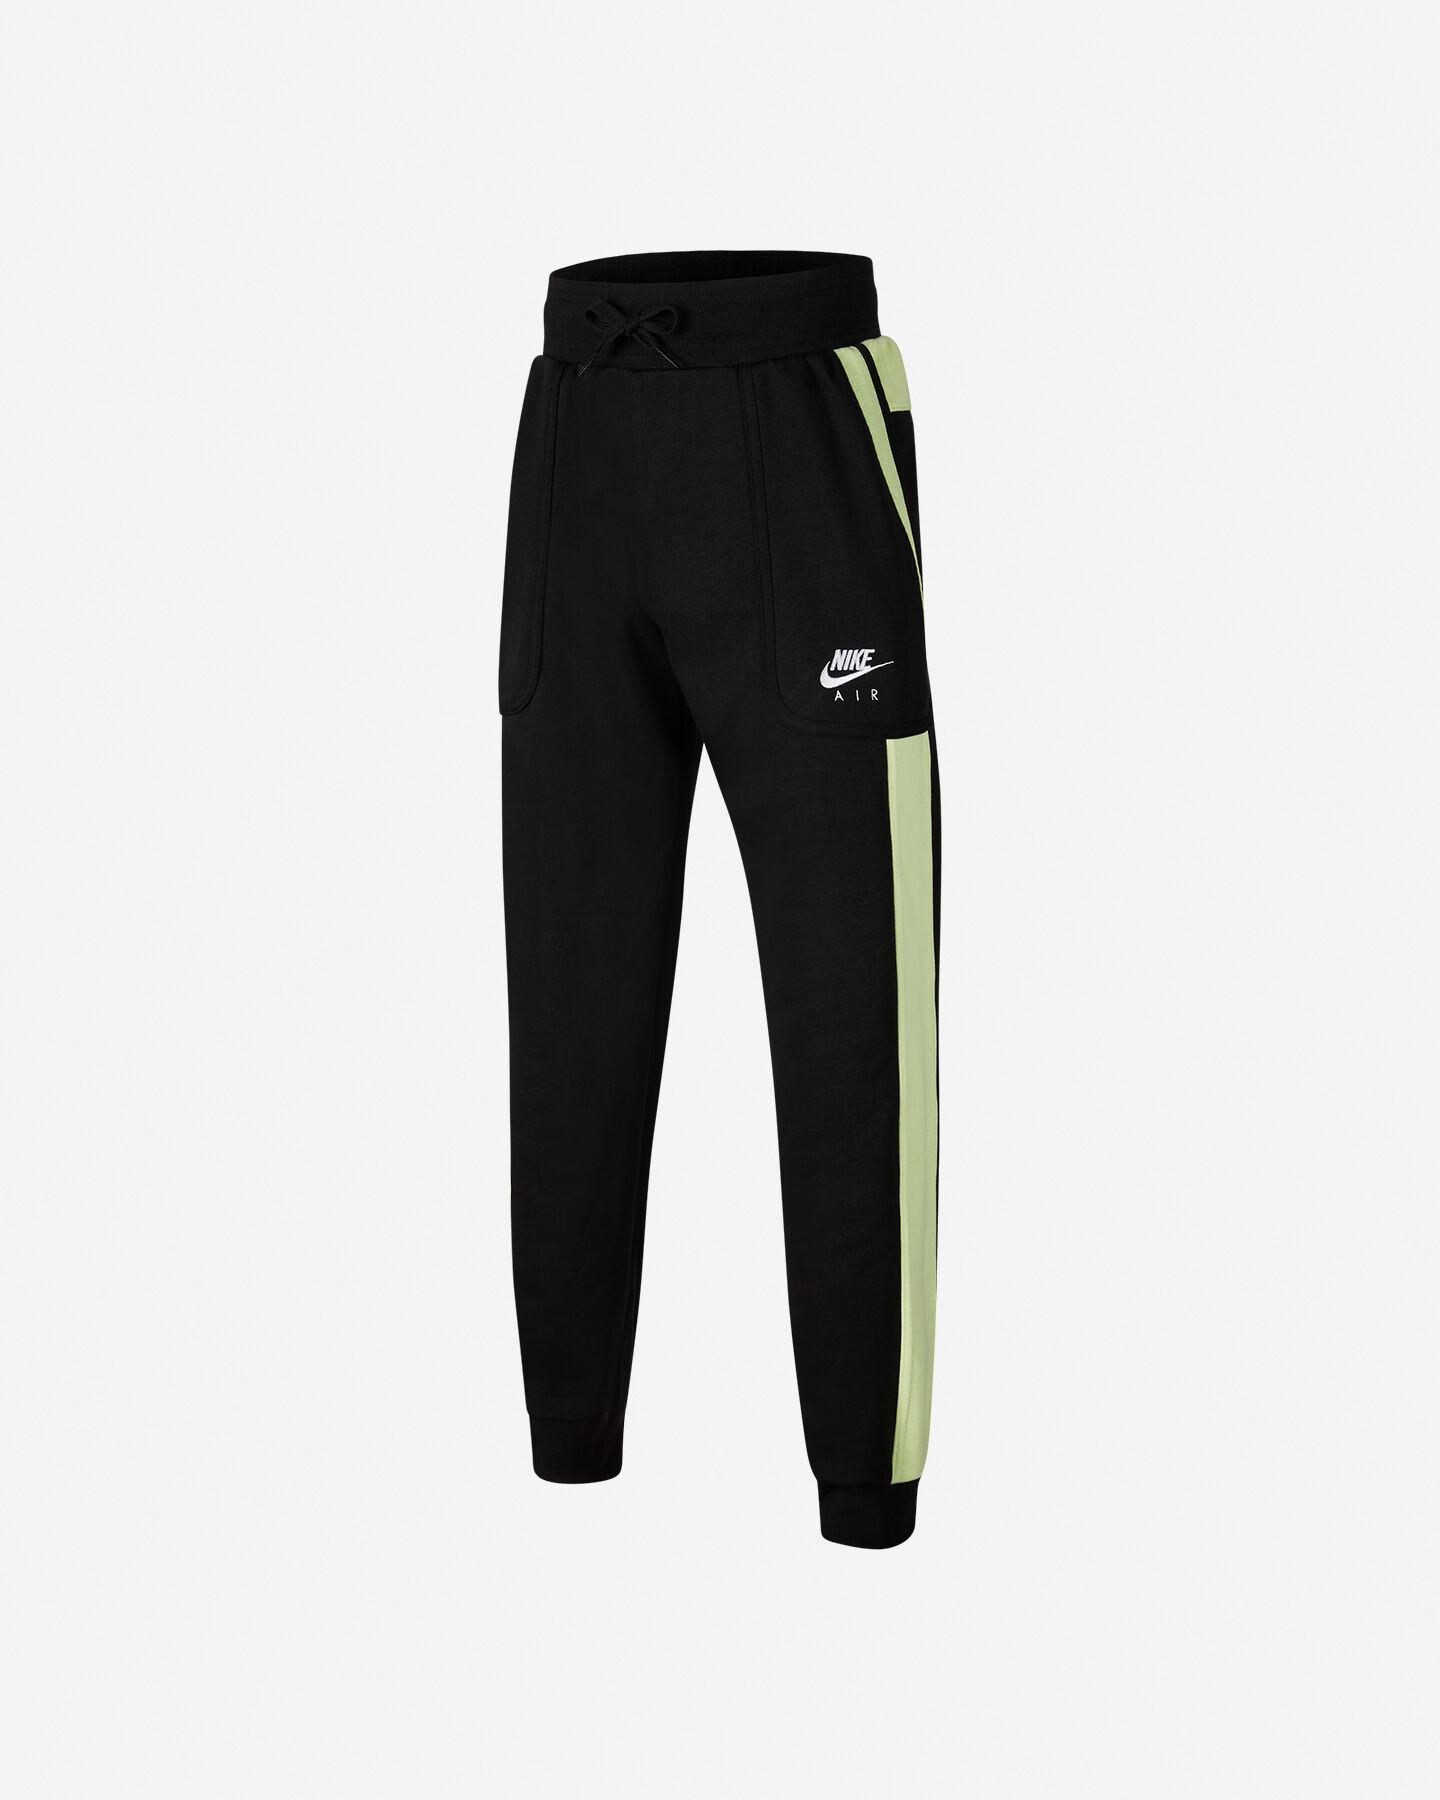 Pantalone NIKE AIR JR S5270002 scatto 0